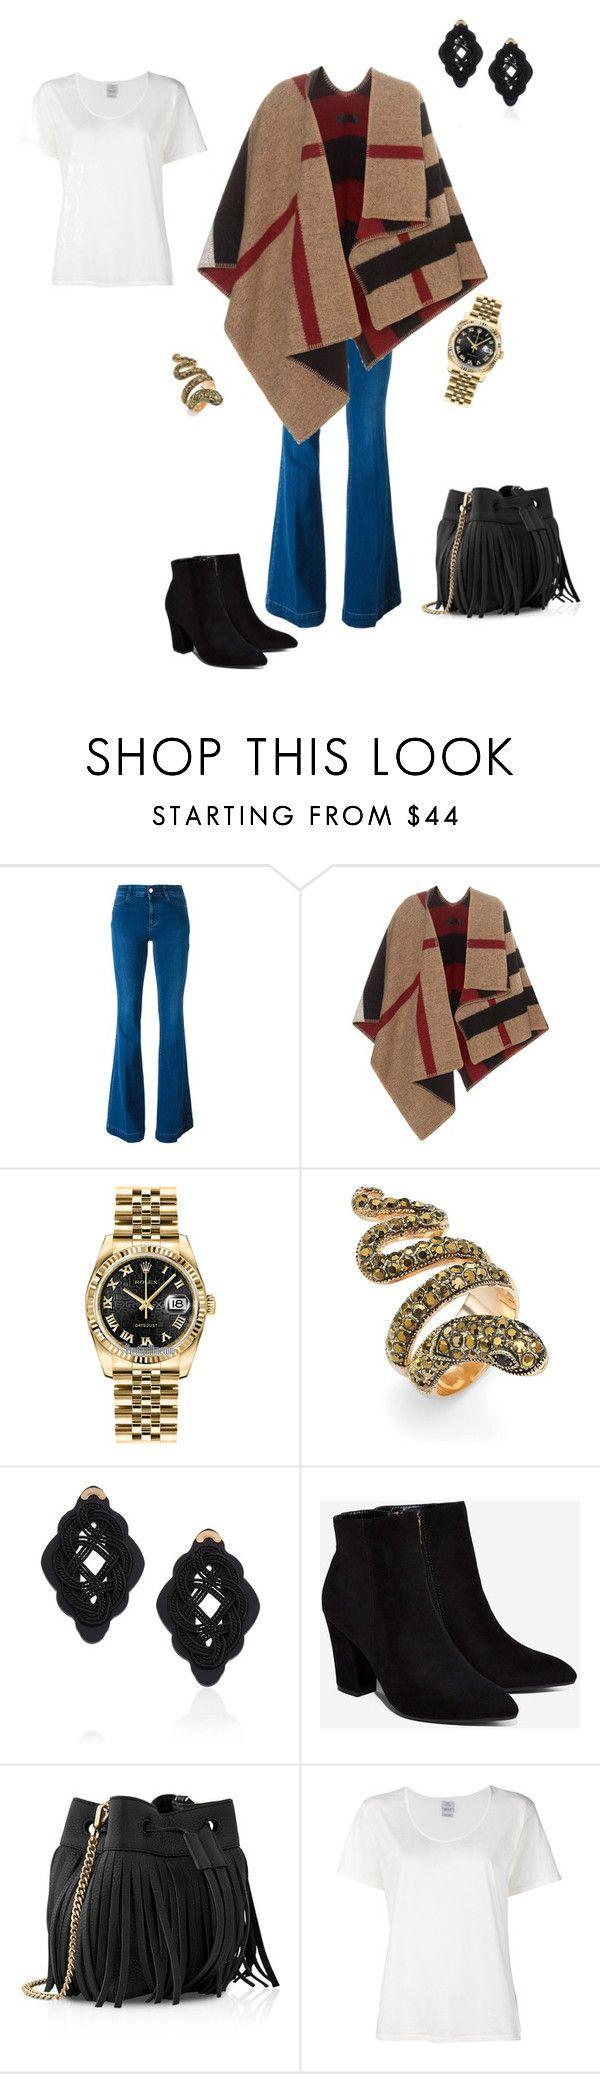 Outfit perfecto para este frío viernes! by michelle-bilodeau on Polyvore featuring moda, Visvim, Burberry, STELLA McCARTNEY, Billini, Whistles, Rolex, Anna e Alex and Palm Beach Jewelry